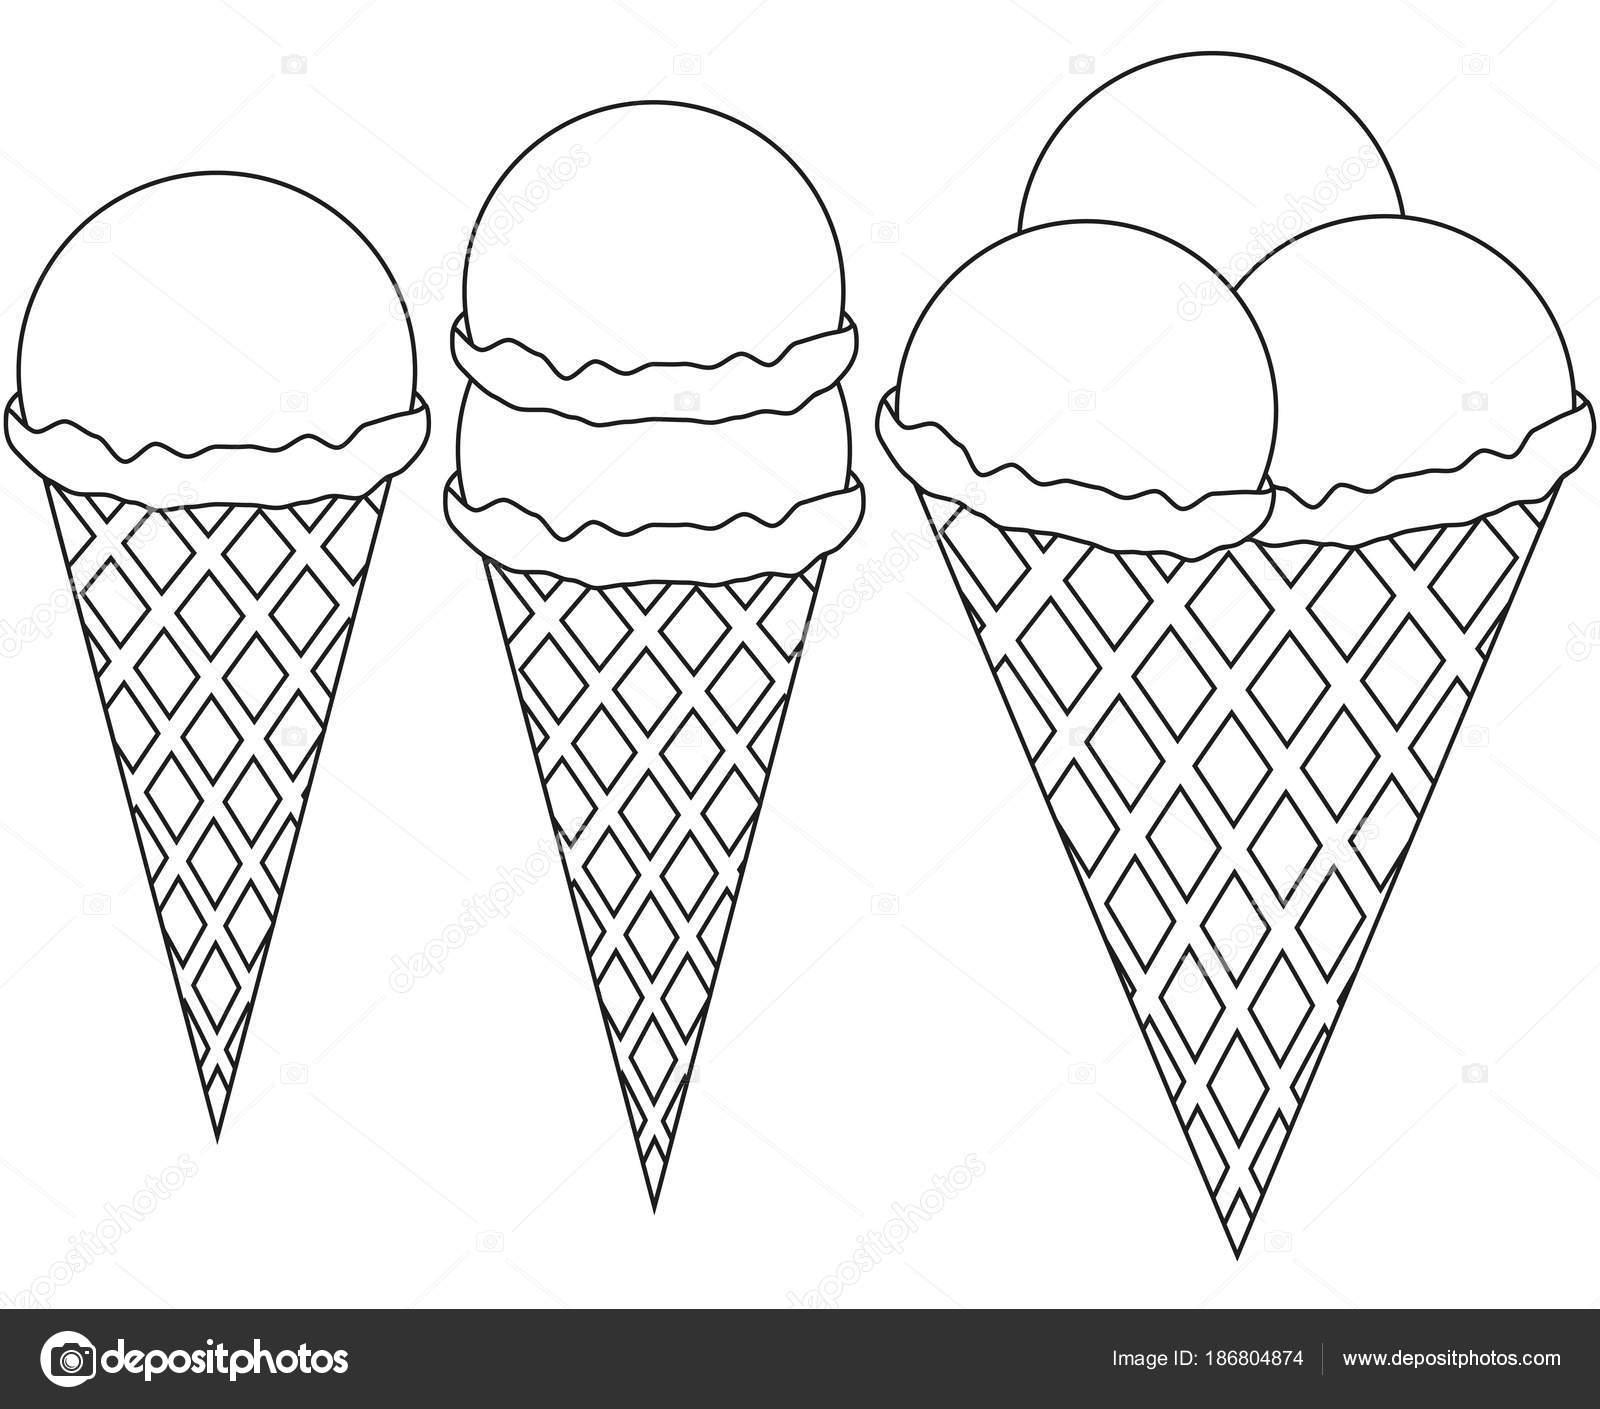 Мороженое 1 2 3 шар Конус черно-белый набор значок ...